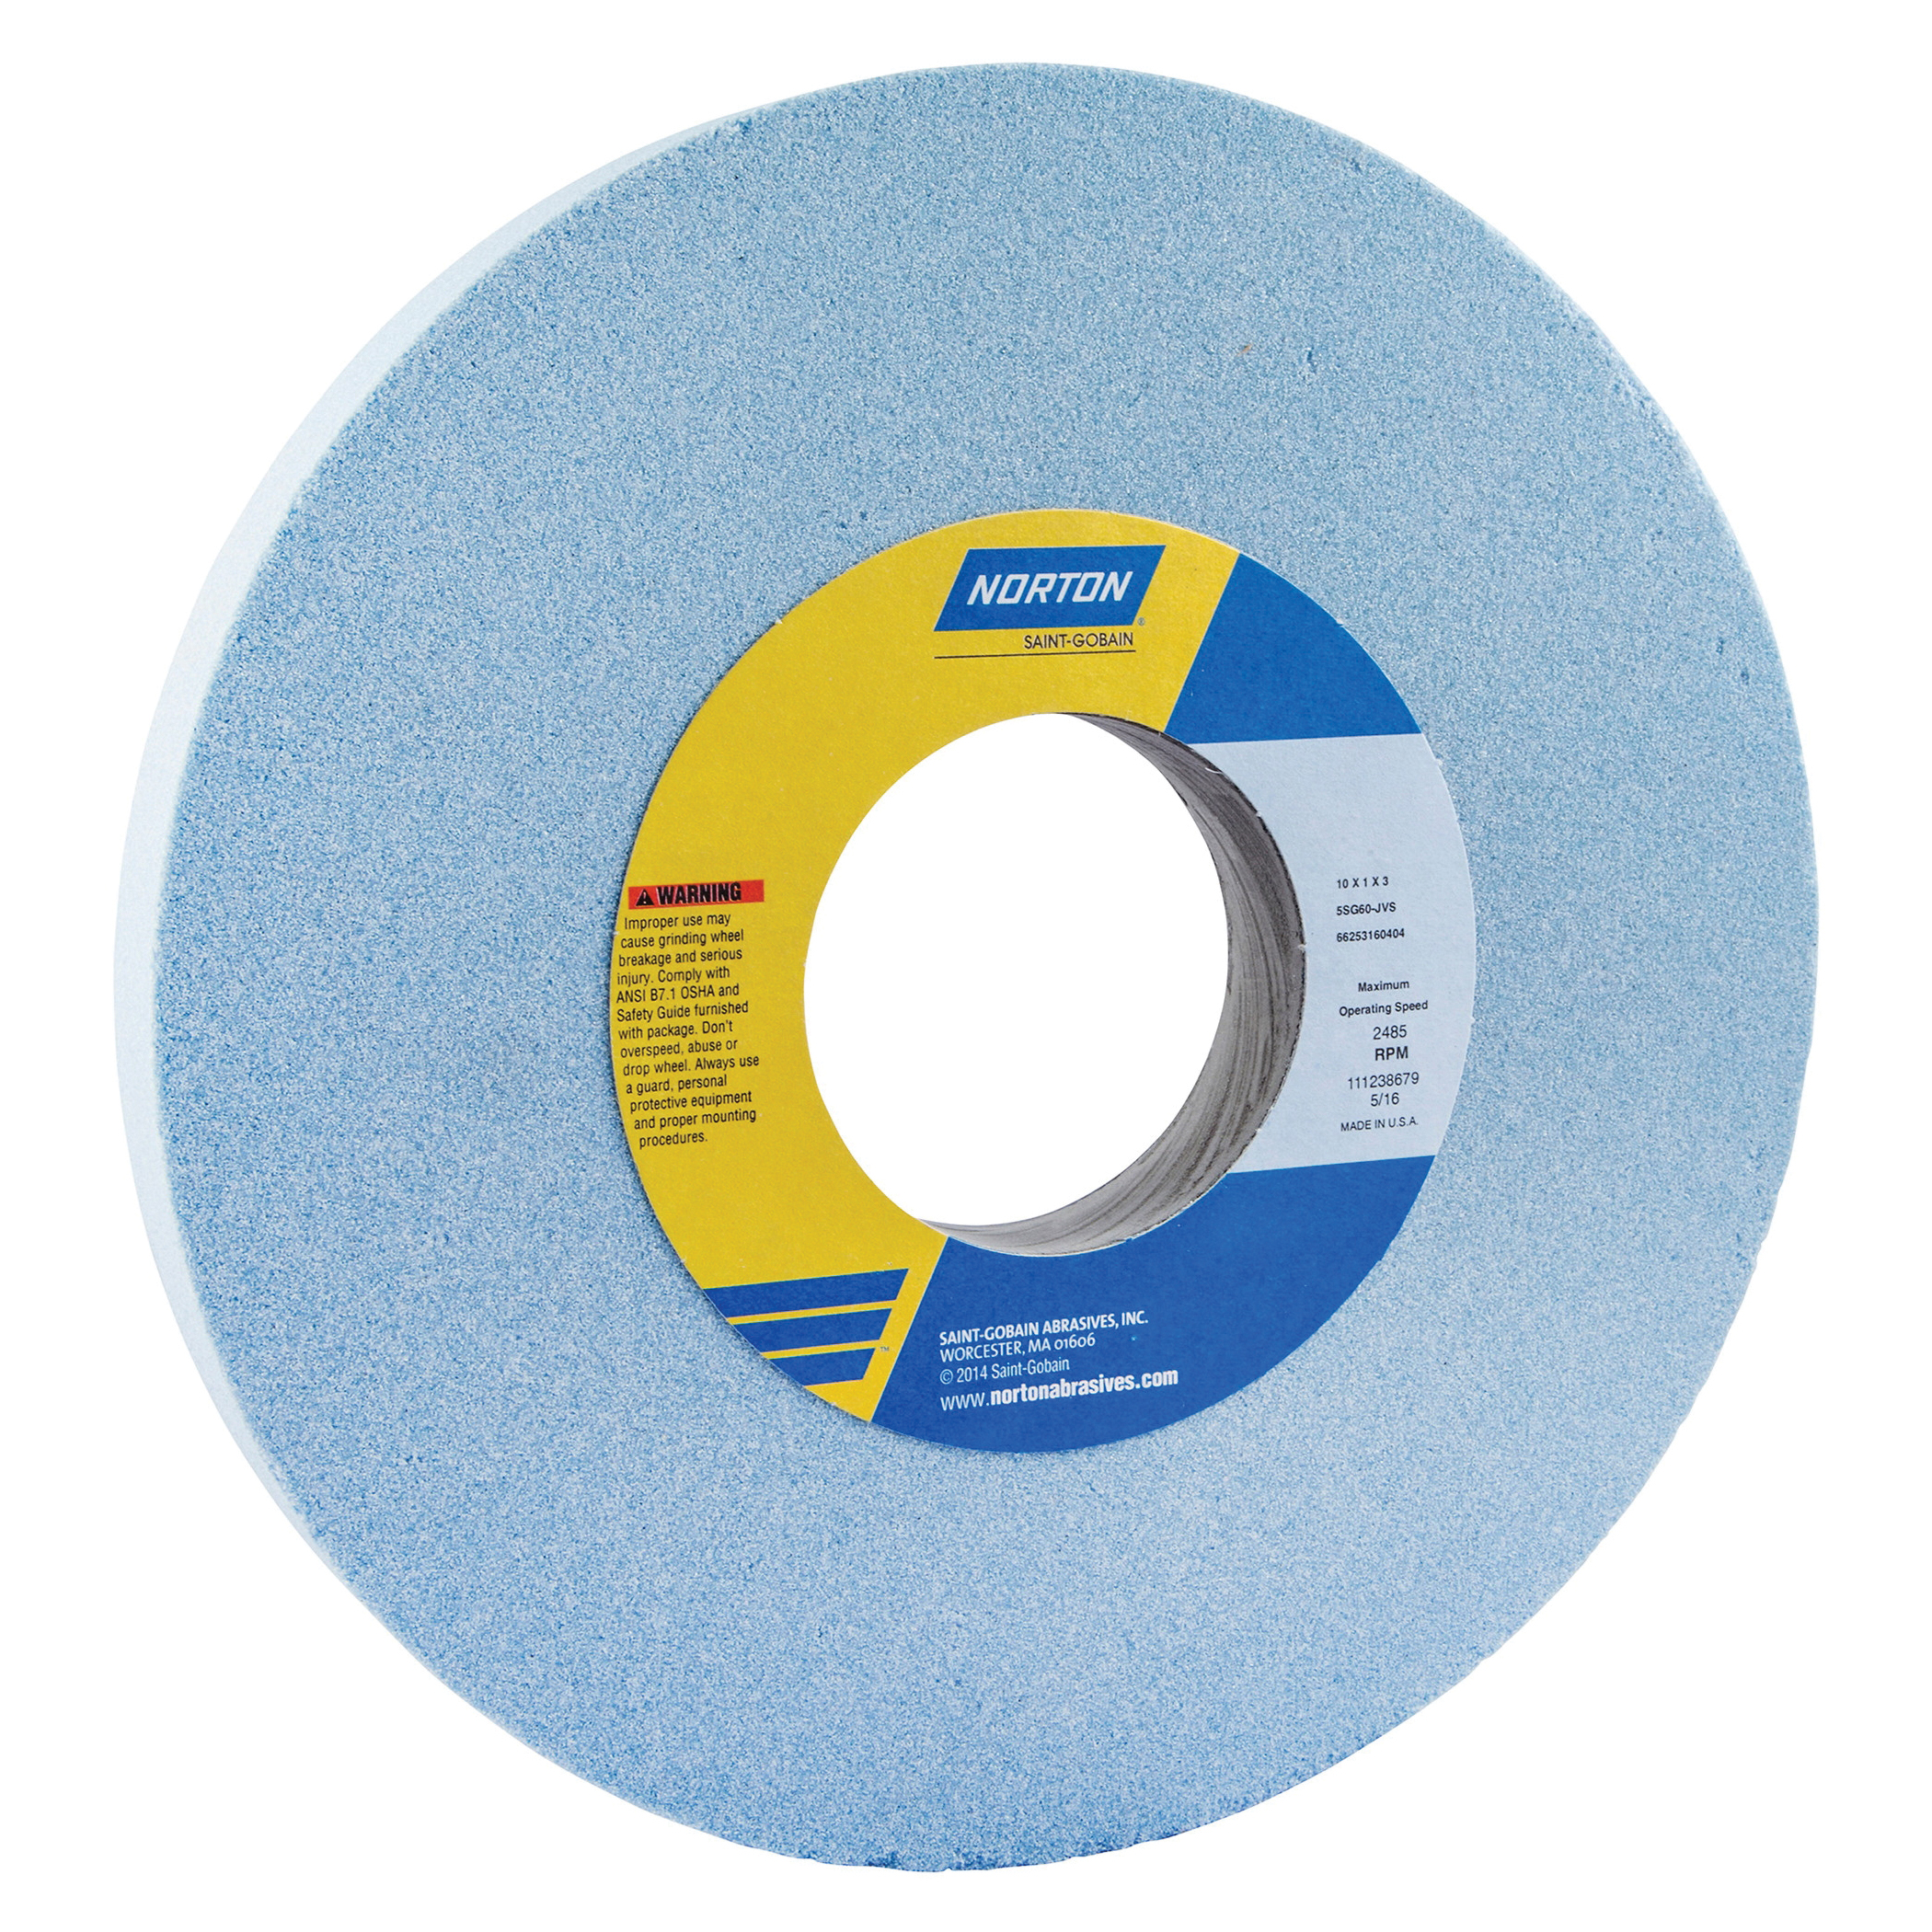 Norton® 66253160402 5SG Straight Toolroom Wheel, 10 in Dia x 1 in THK, 3 in Center Hole, 46 Grit, Ceramic Alumina/Friable Aluminum Oxide Abrasive